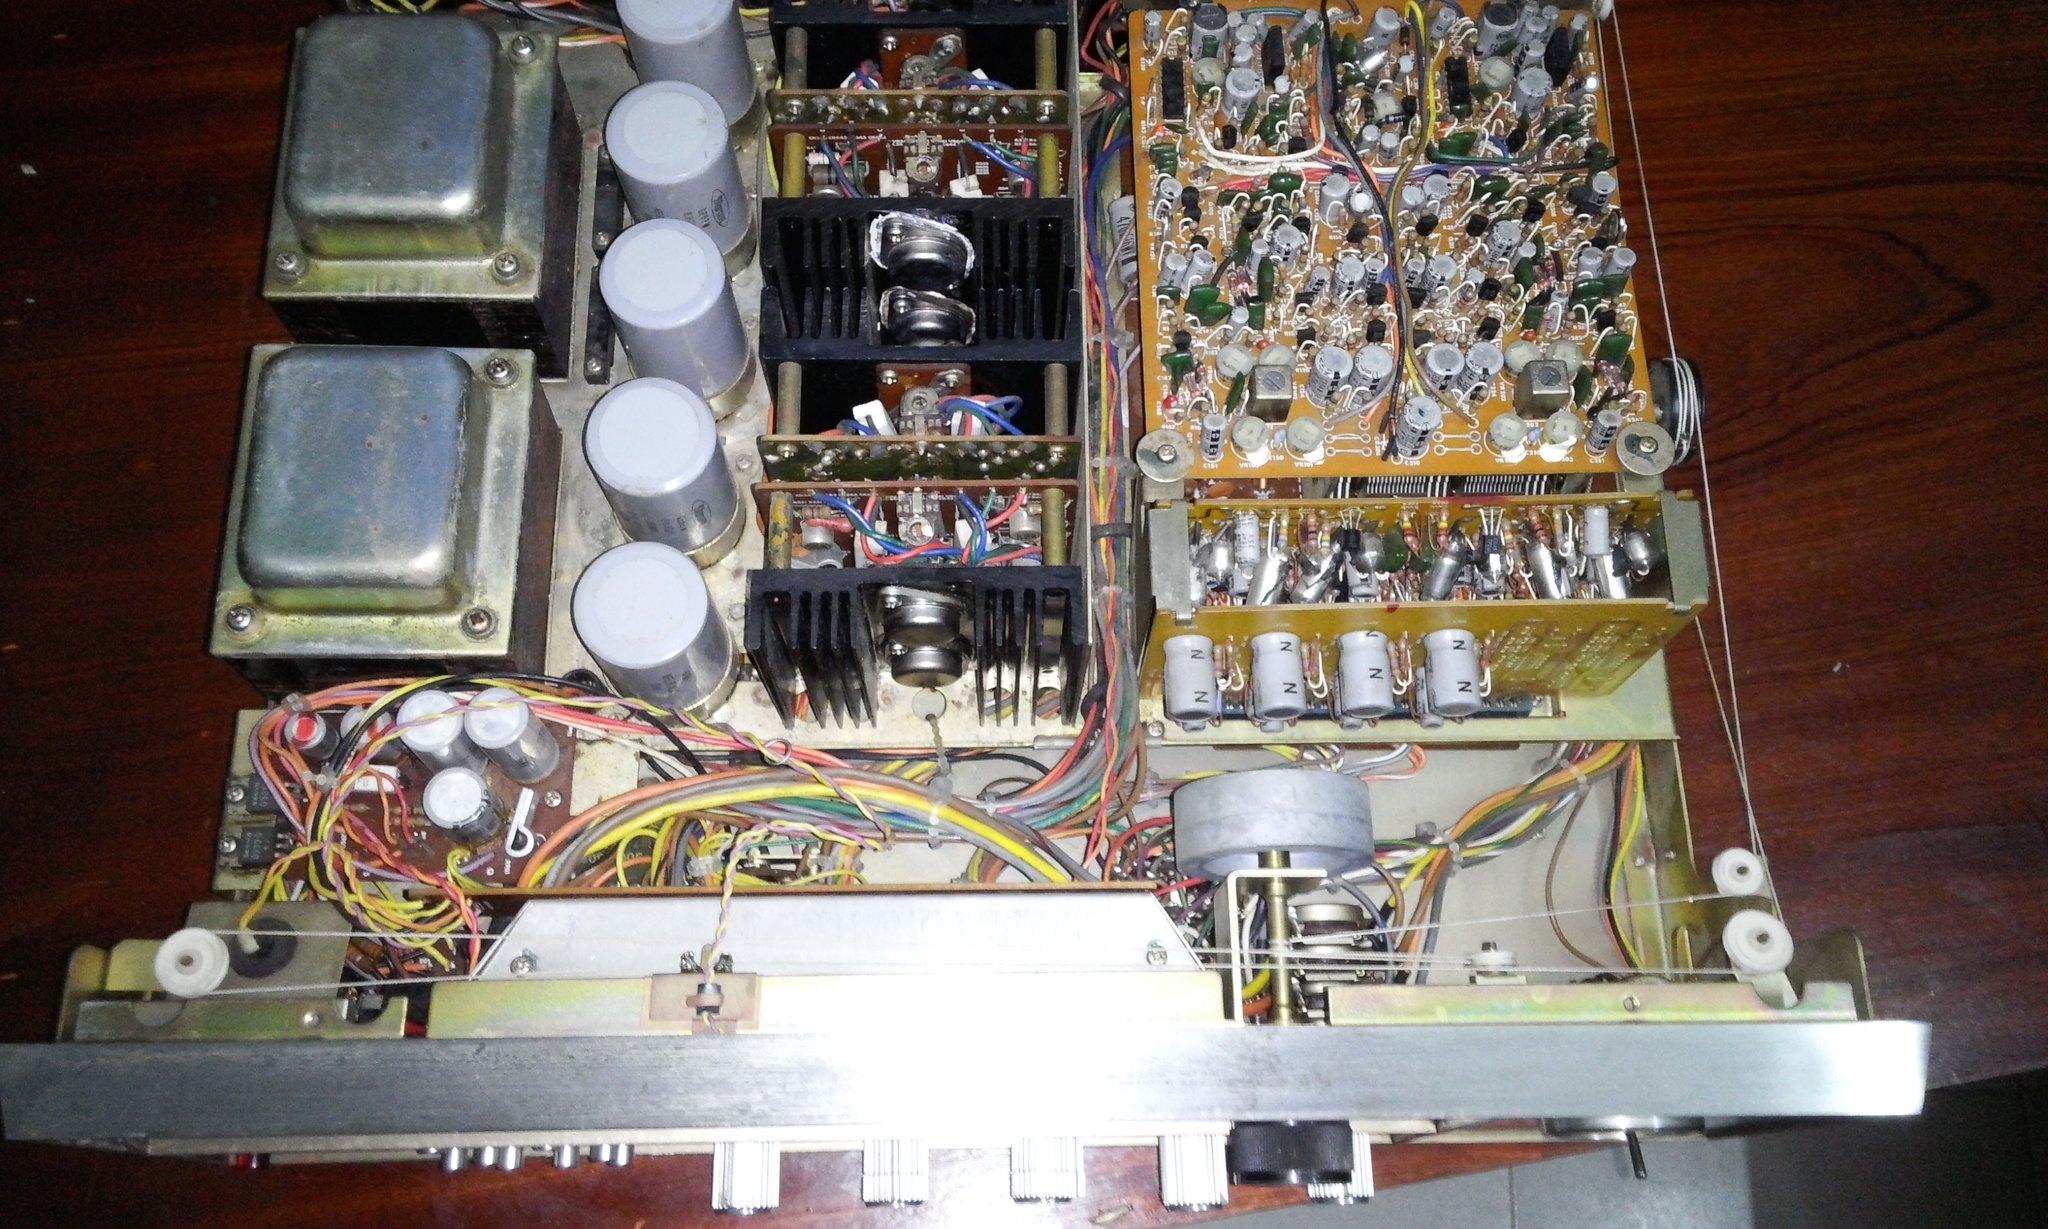 NHO AUDIO-Chuyên loa sub điện -ampli -loa  mỹ -anh - 43